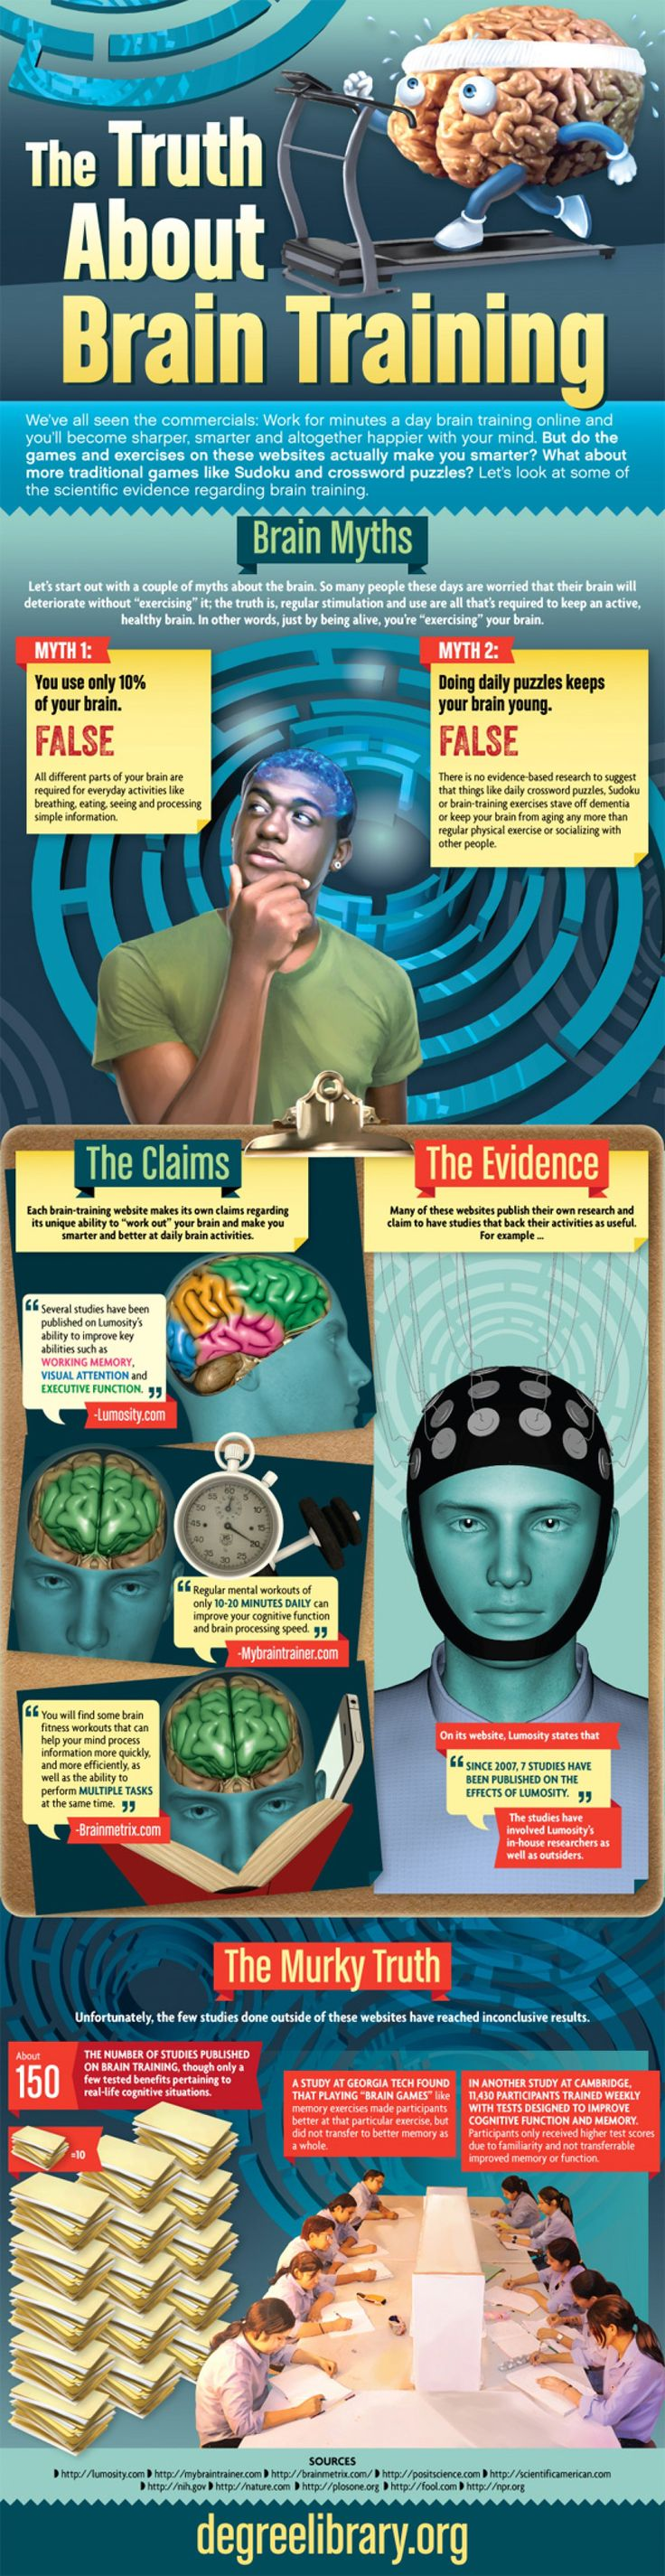 473 best Brain Train images on Pinterest | Nervous system, The brain ...